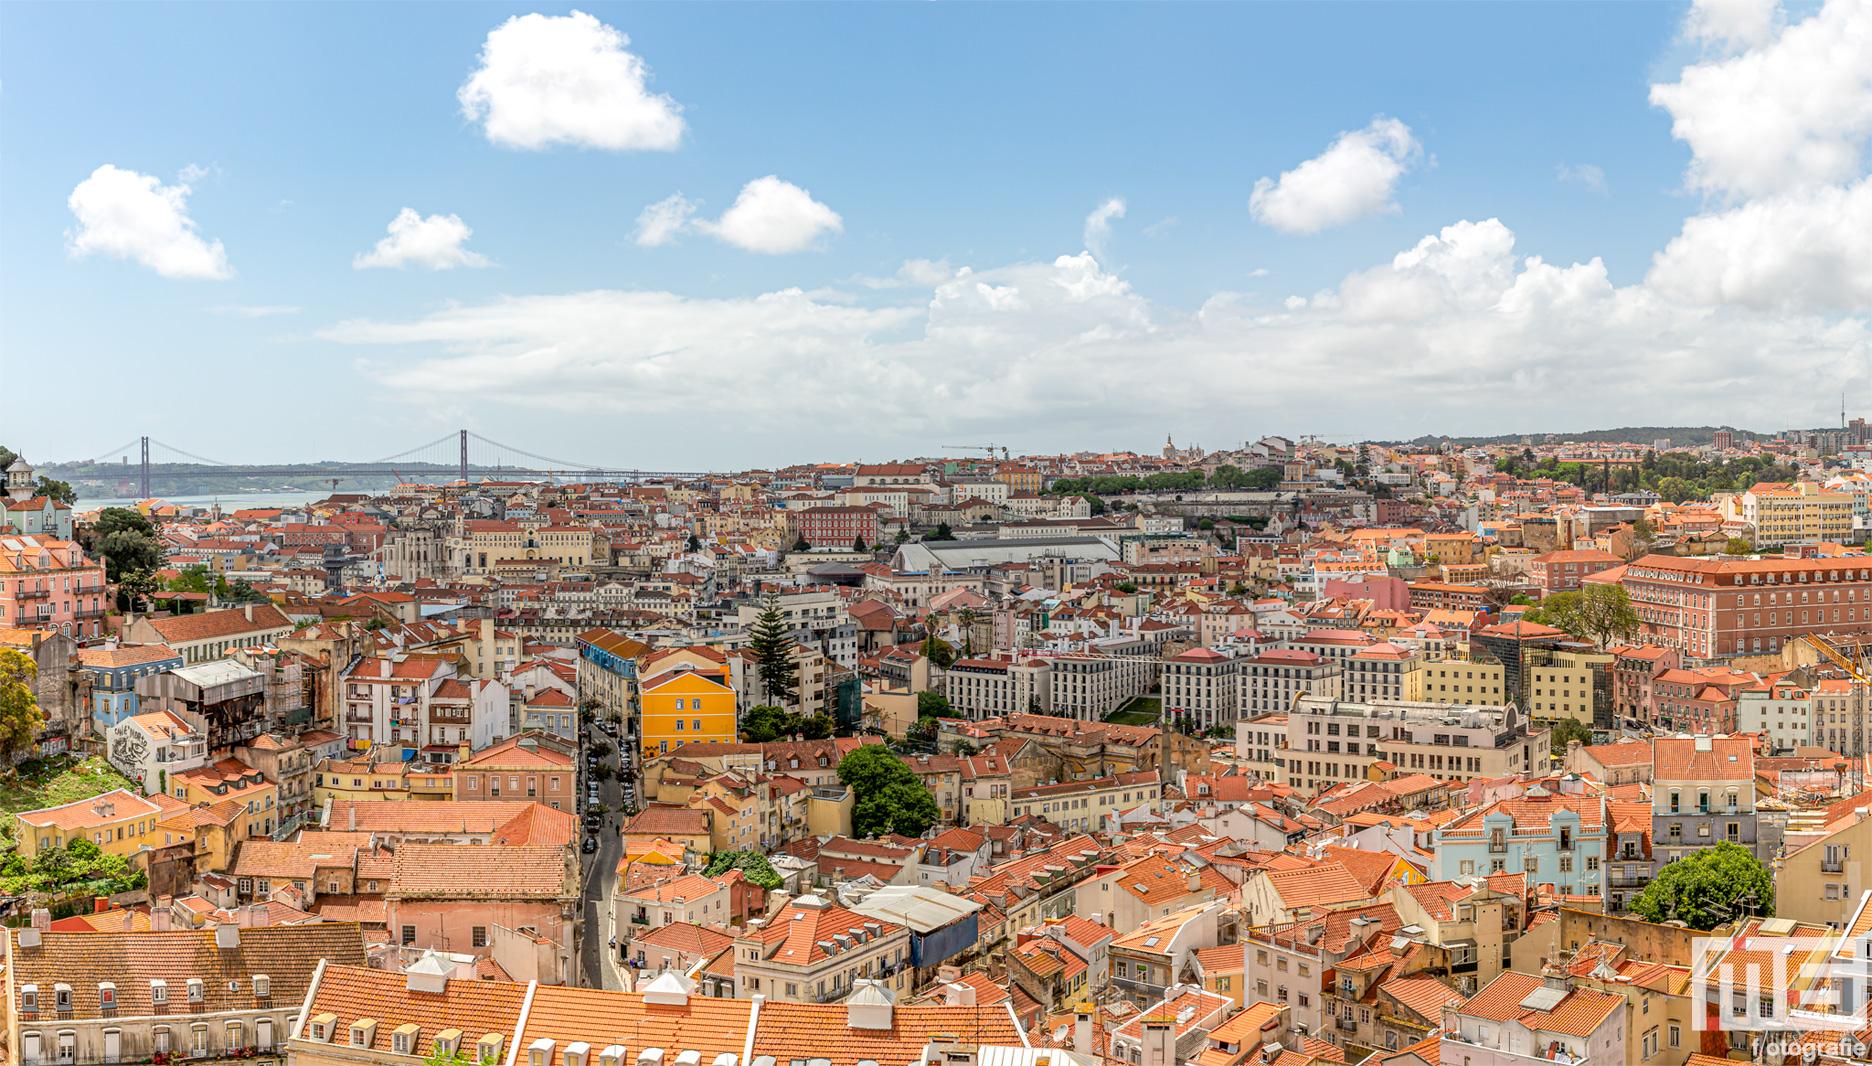 Fotoreis MS Fotografie naar Lissabon 2020 | Cover